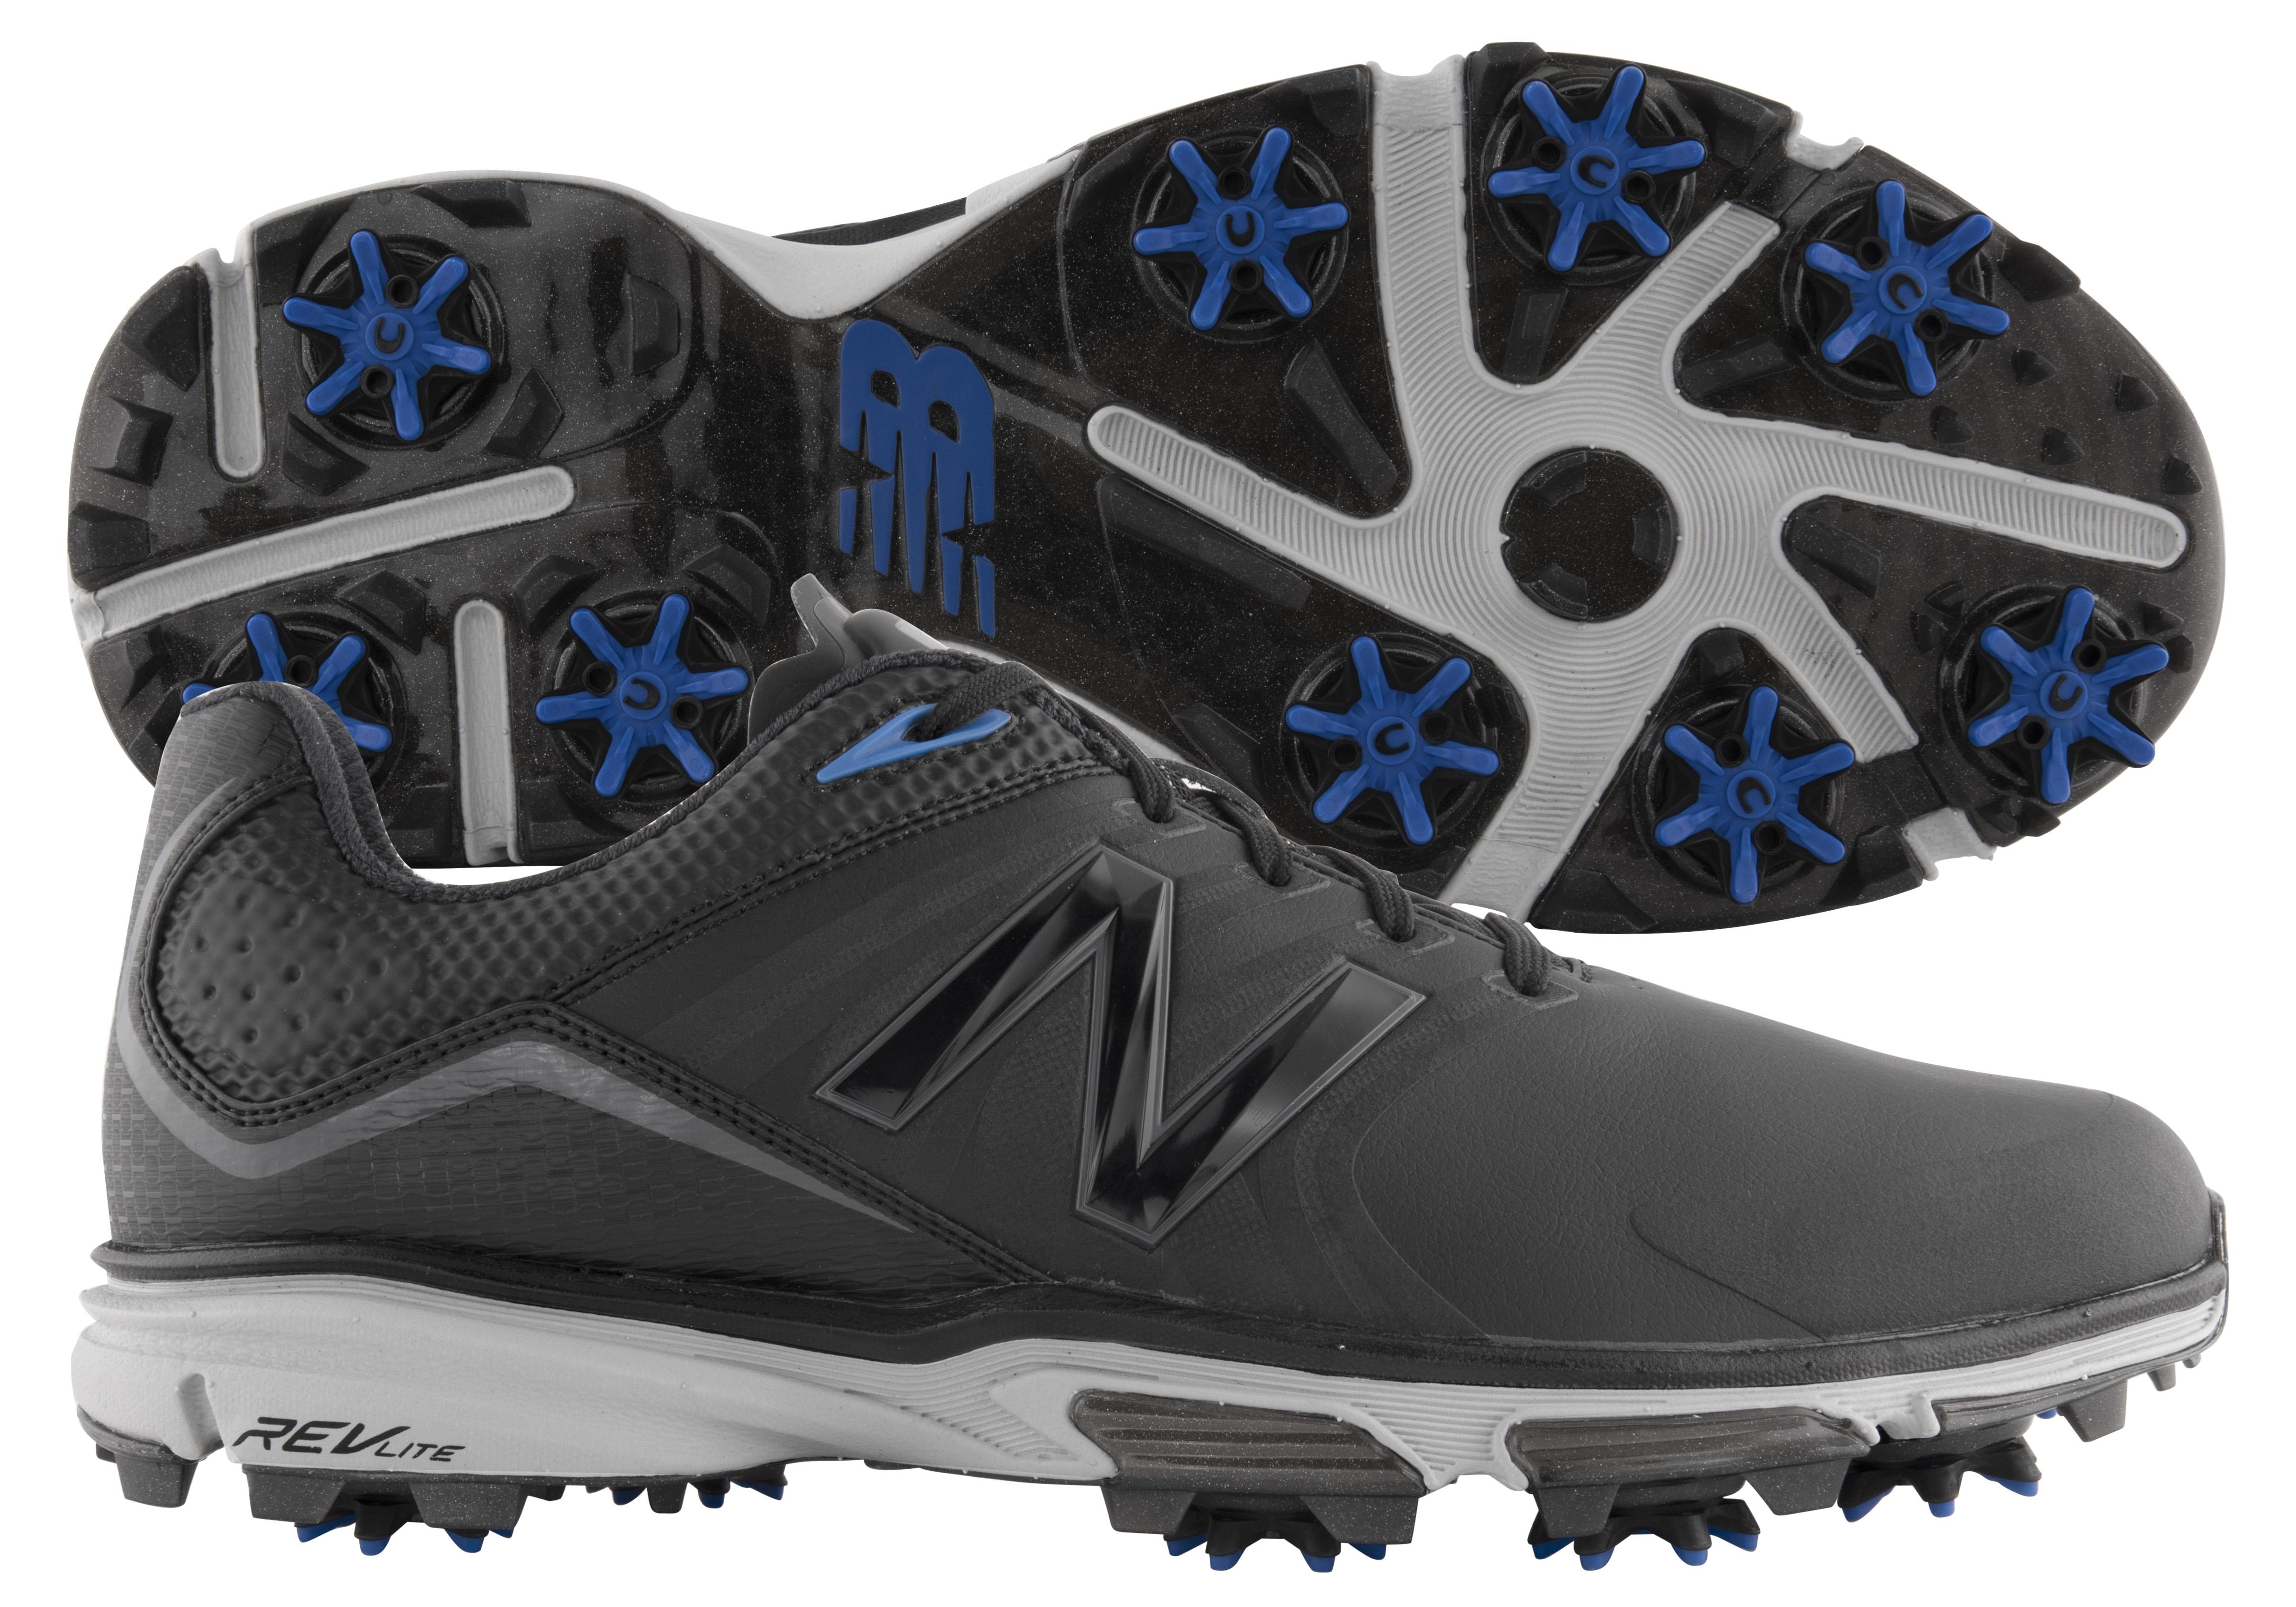 c0d8b5e45817c New Balance NB Tour Shoes | RockBottomGolf.com